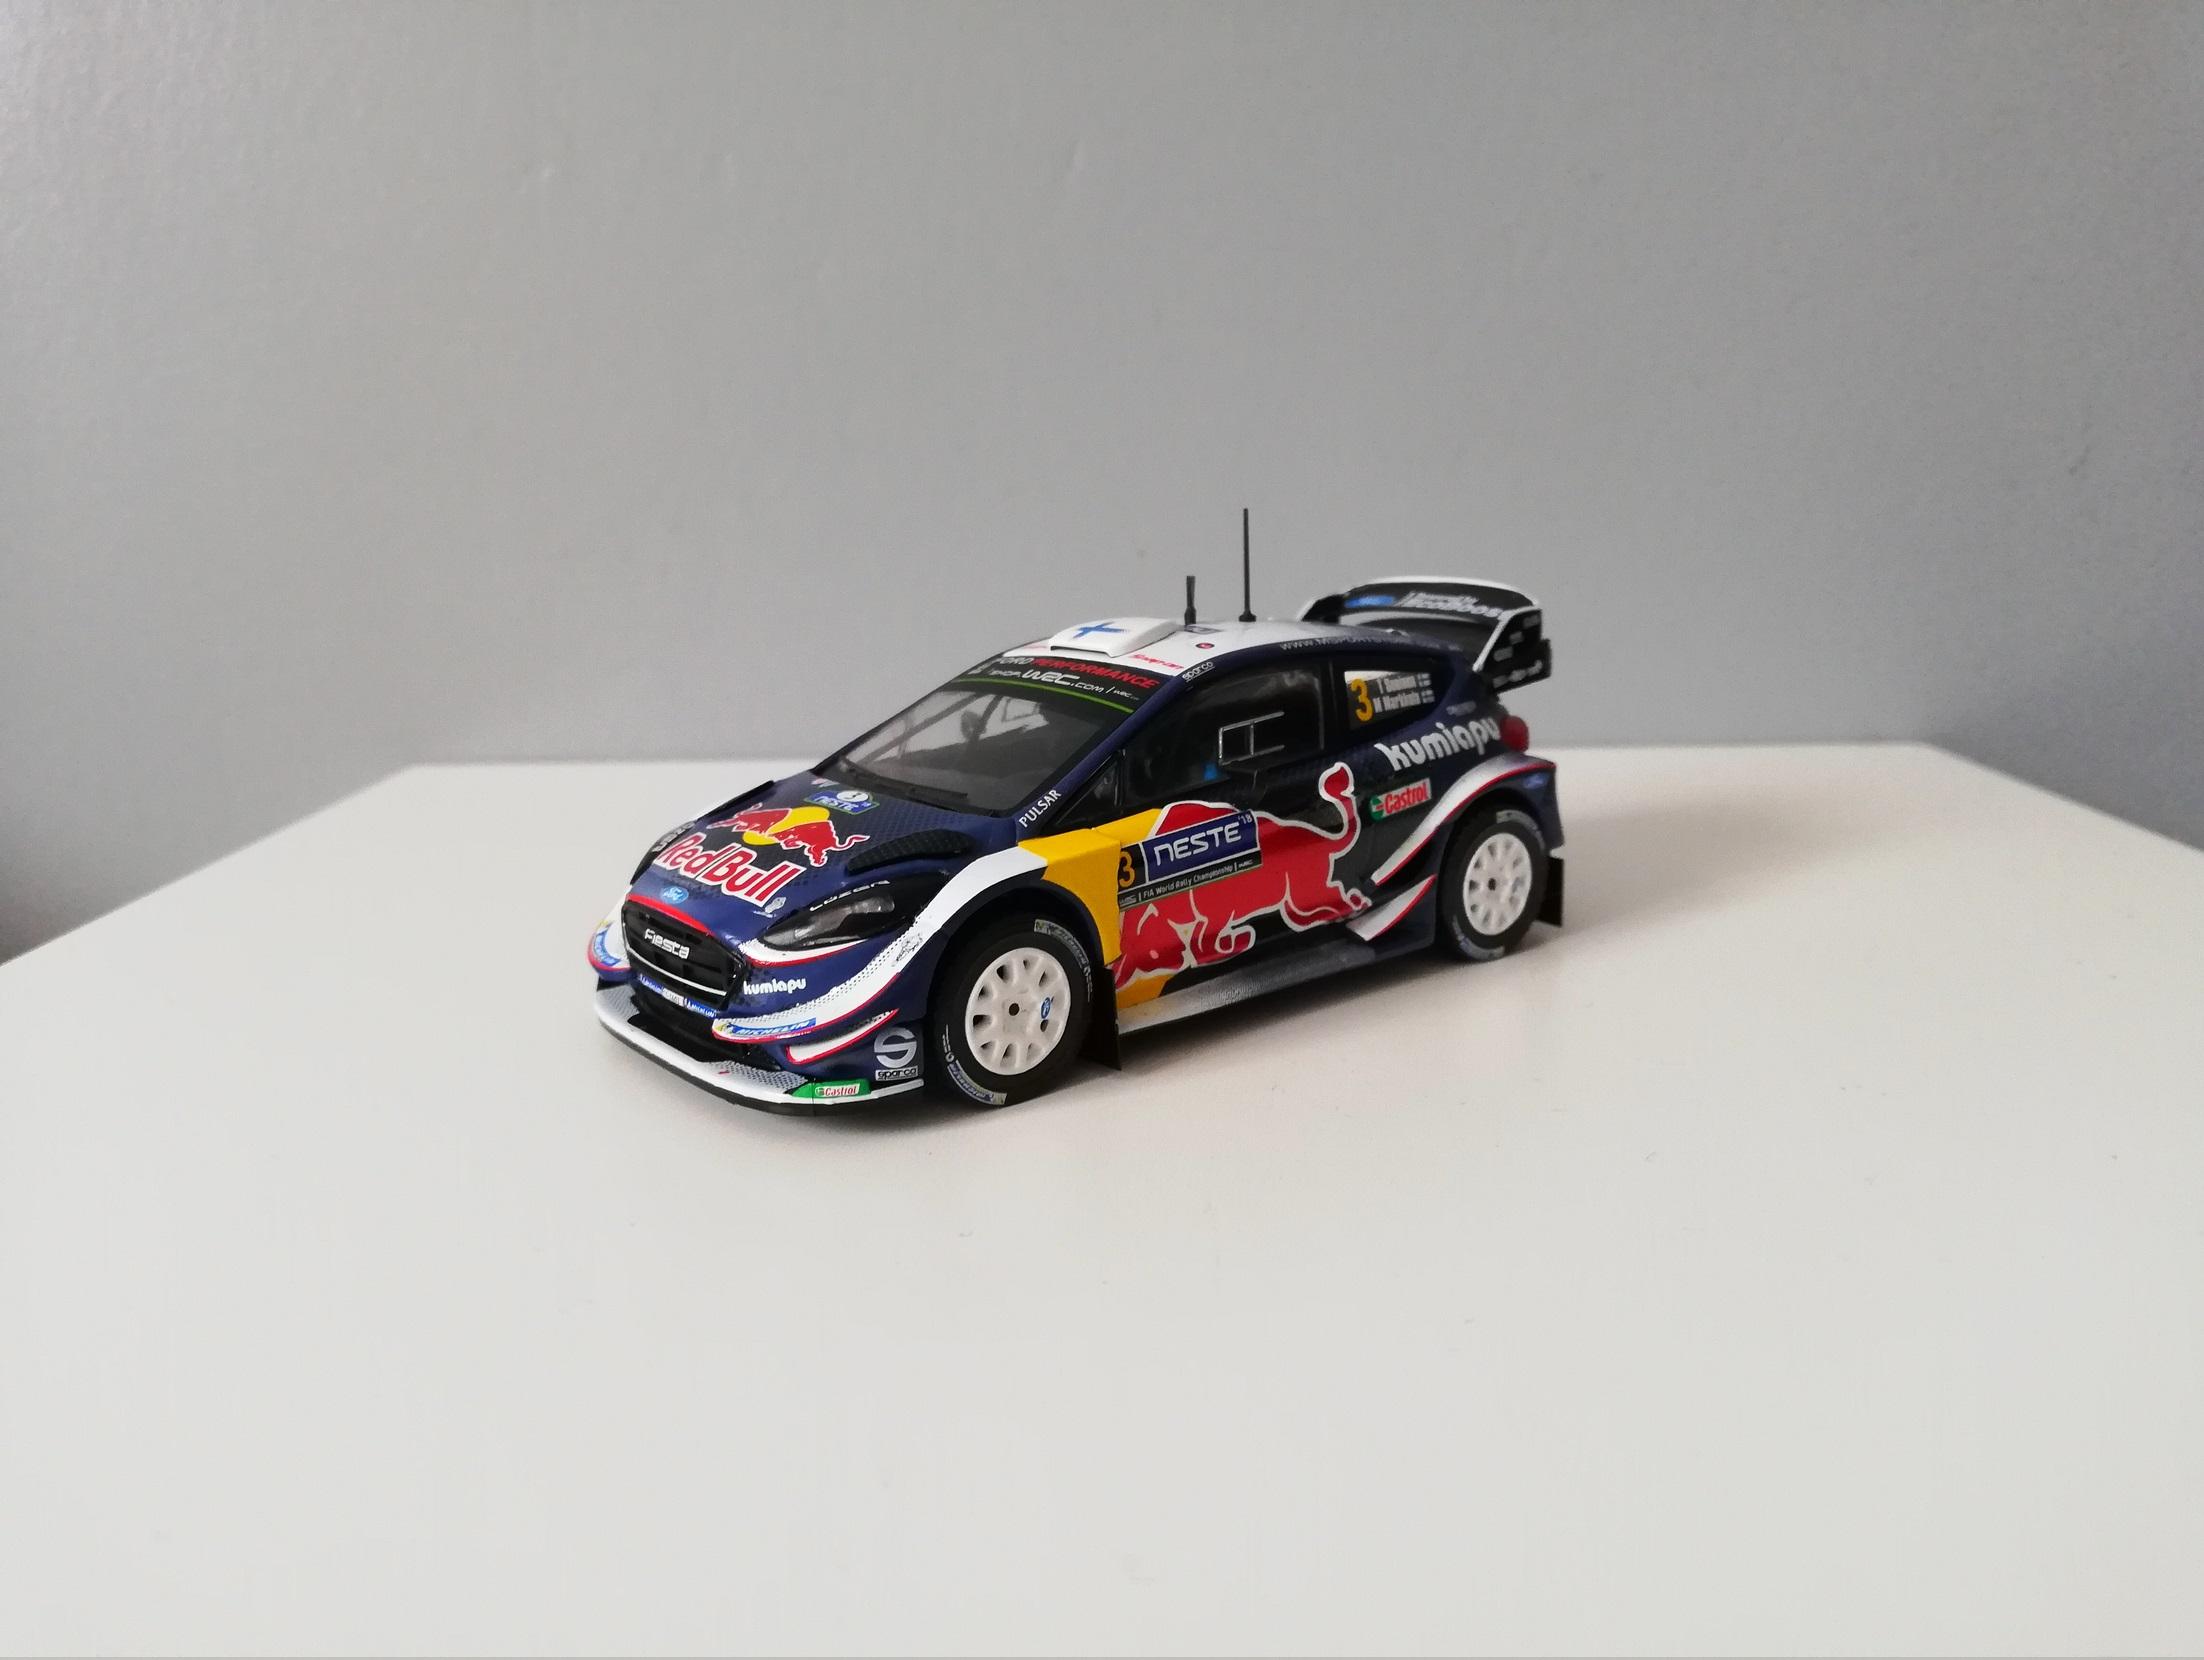 Fiesta WRC suninen 2018.jpg